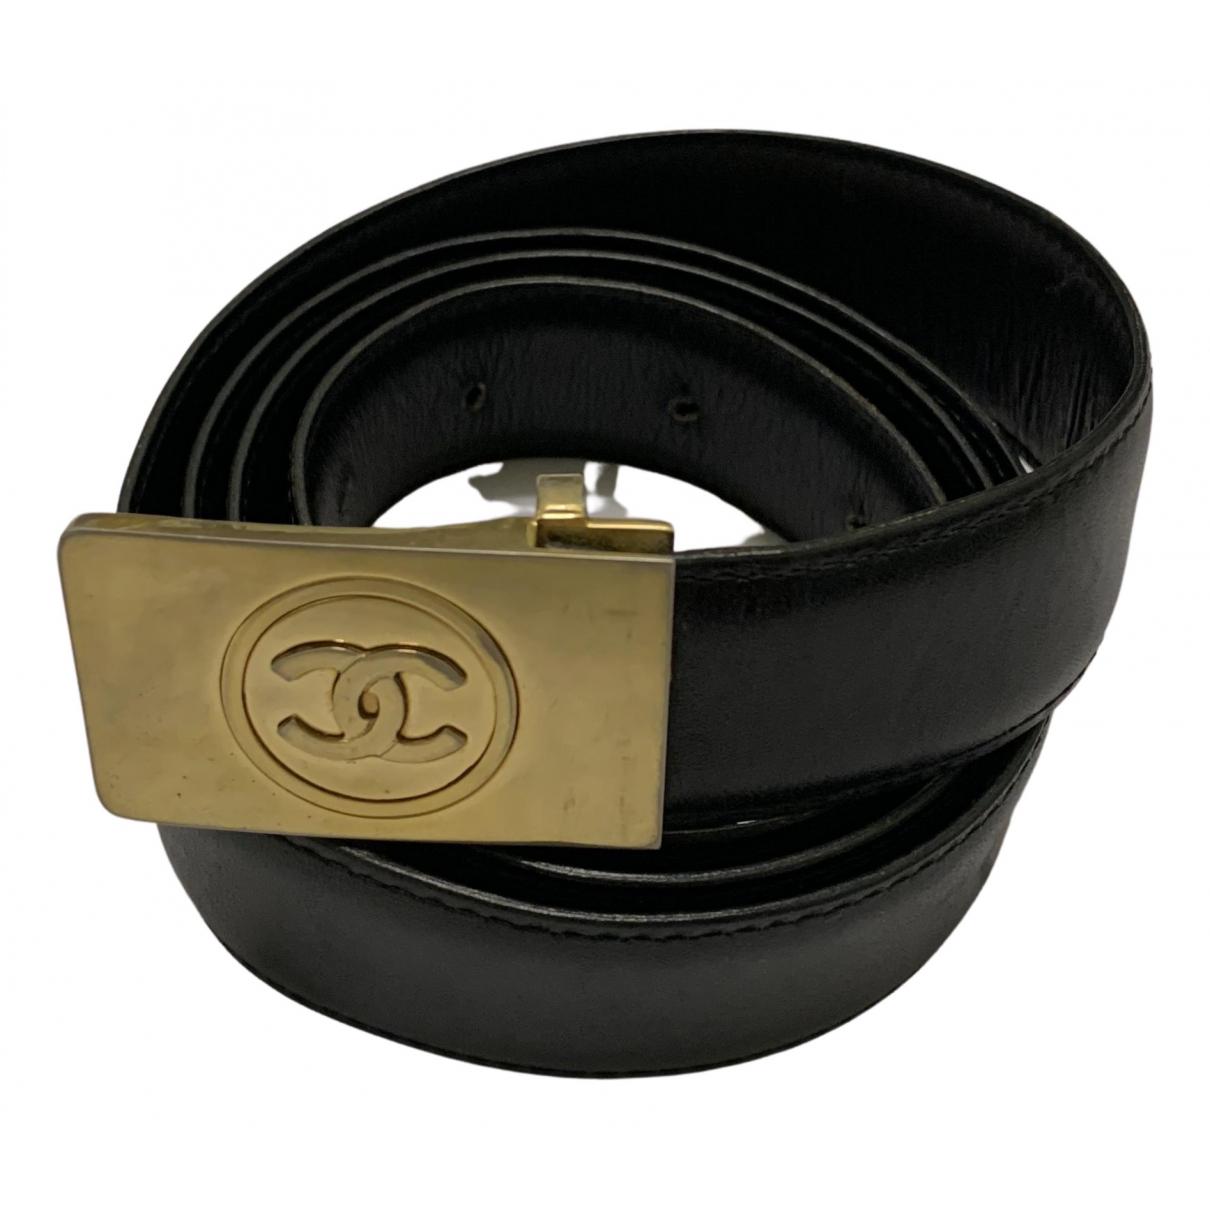 Chanel \N Black Leather belt for Men 35 Inches